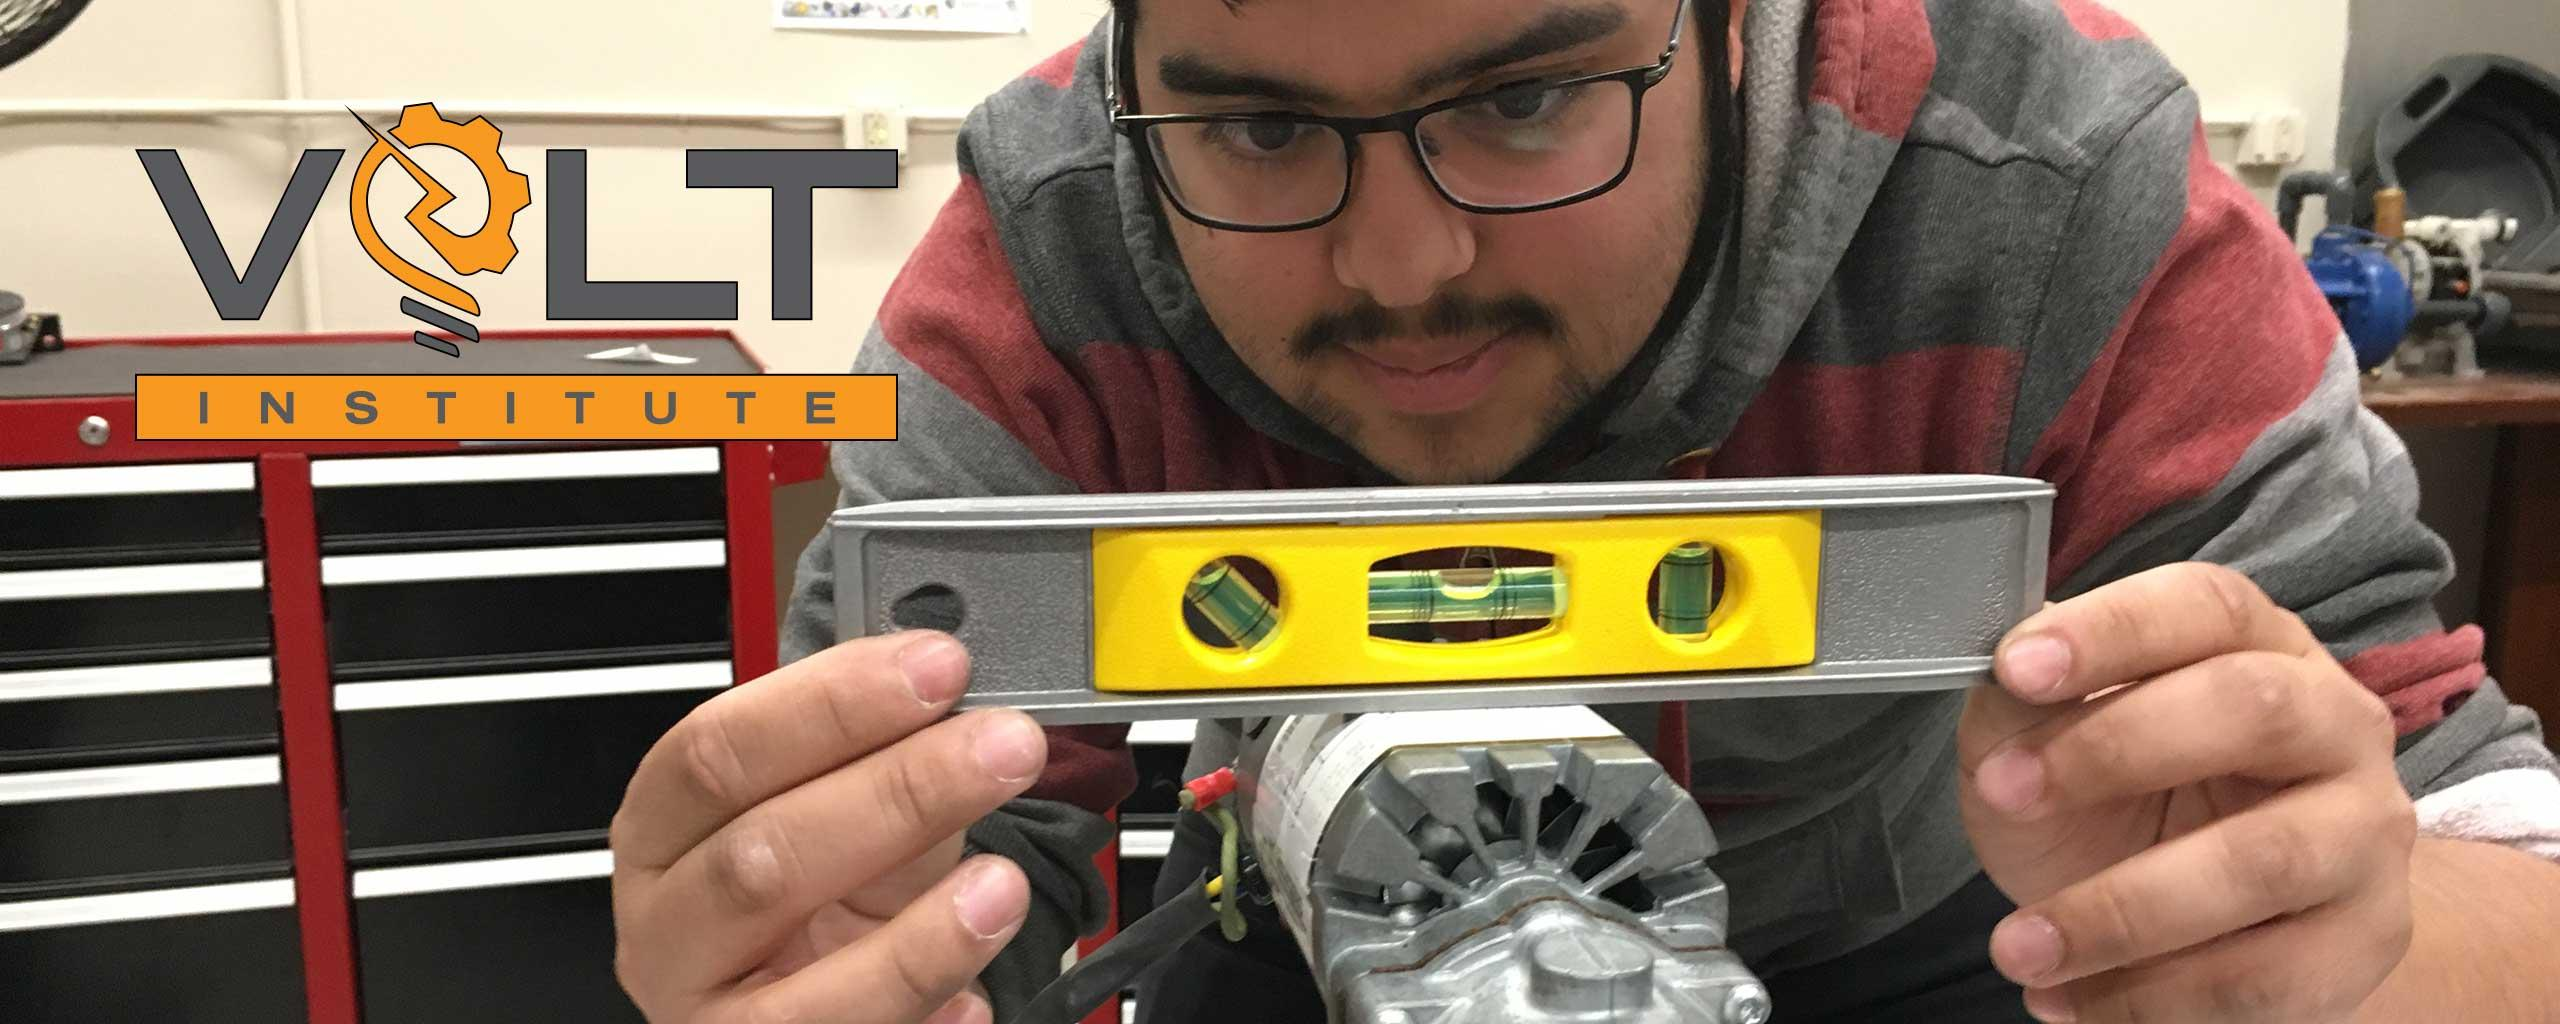 industrial maintenance mechanic training